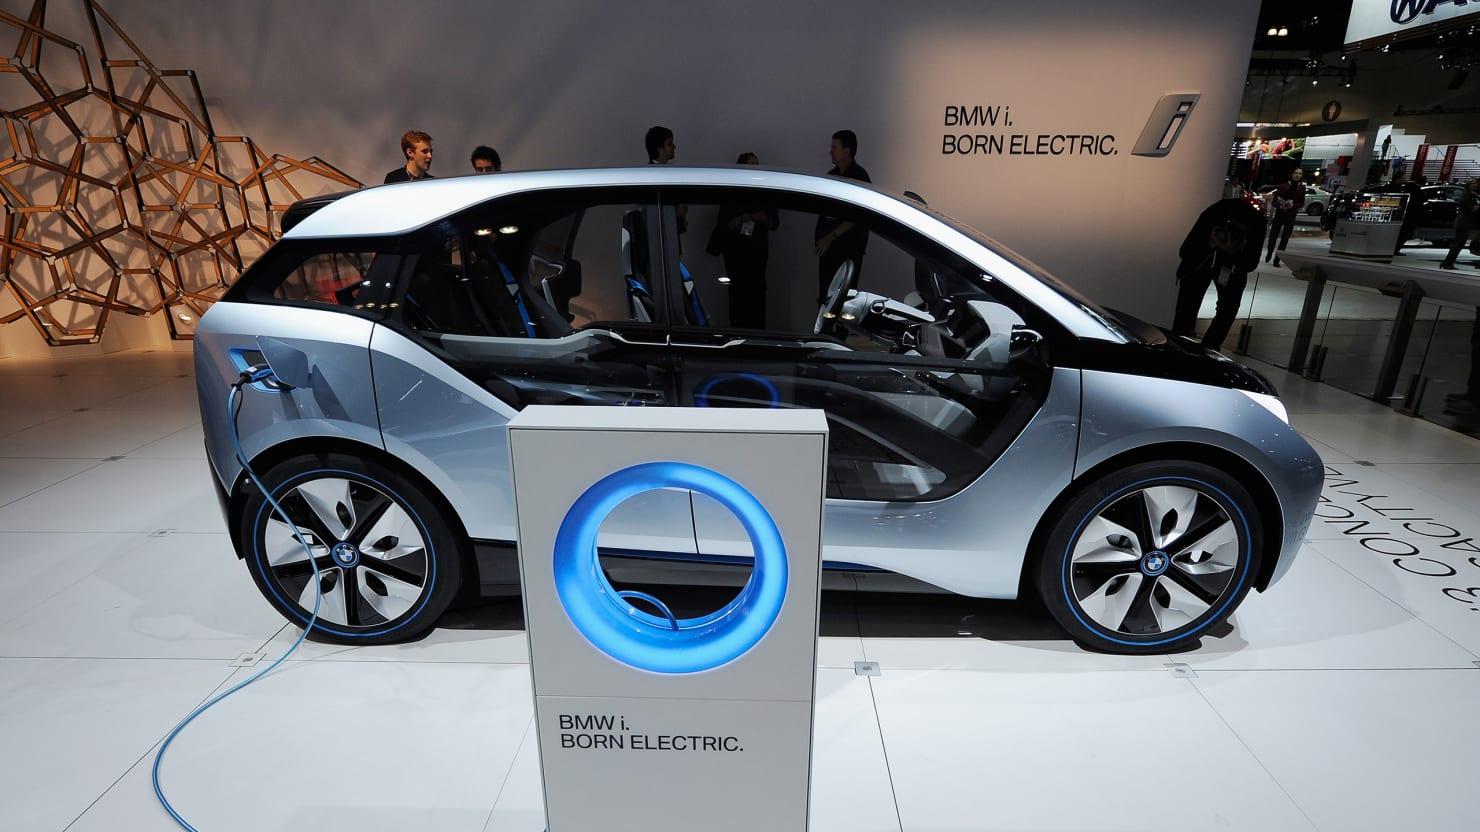 car tesla tease with challenges ferguson kevork bmw new electric